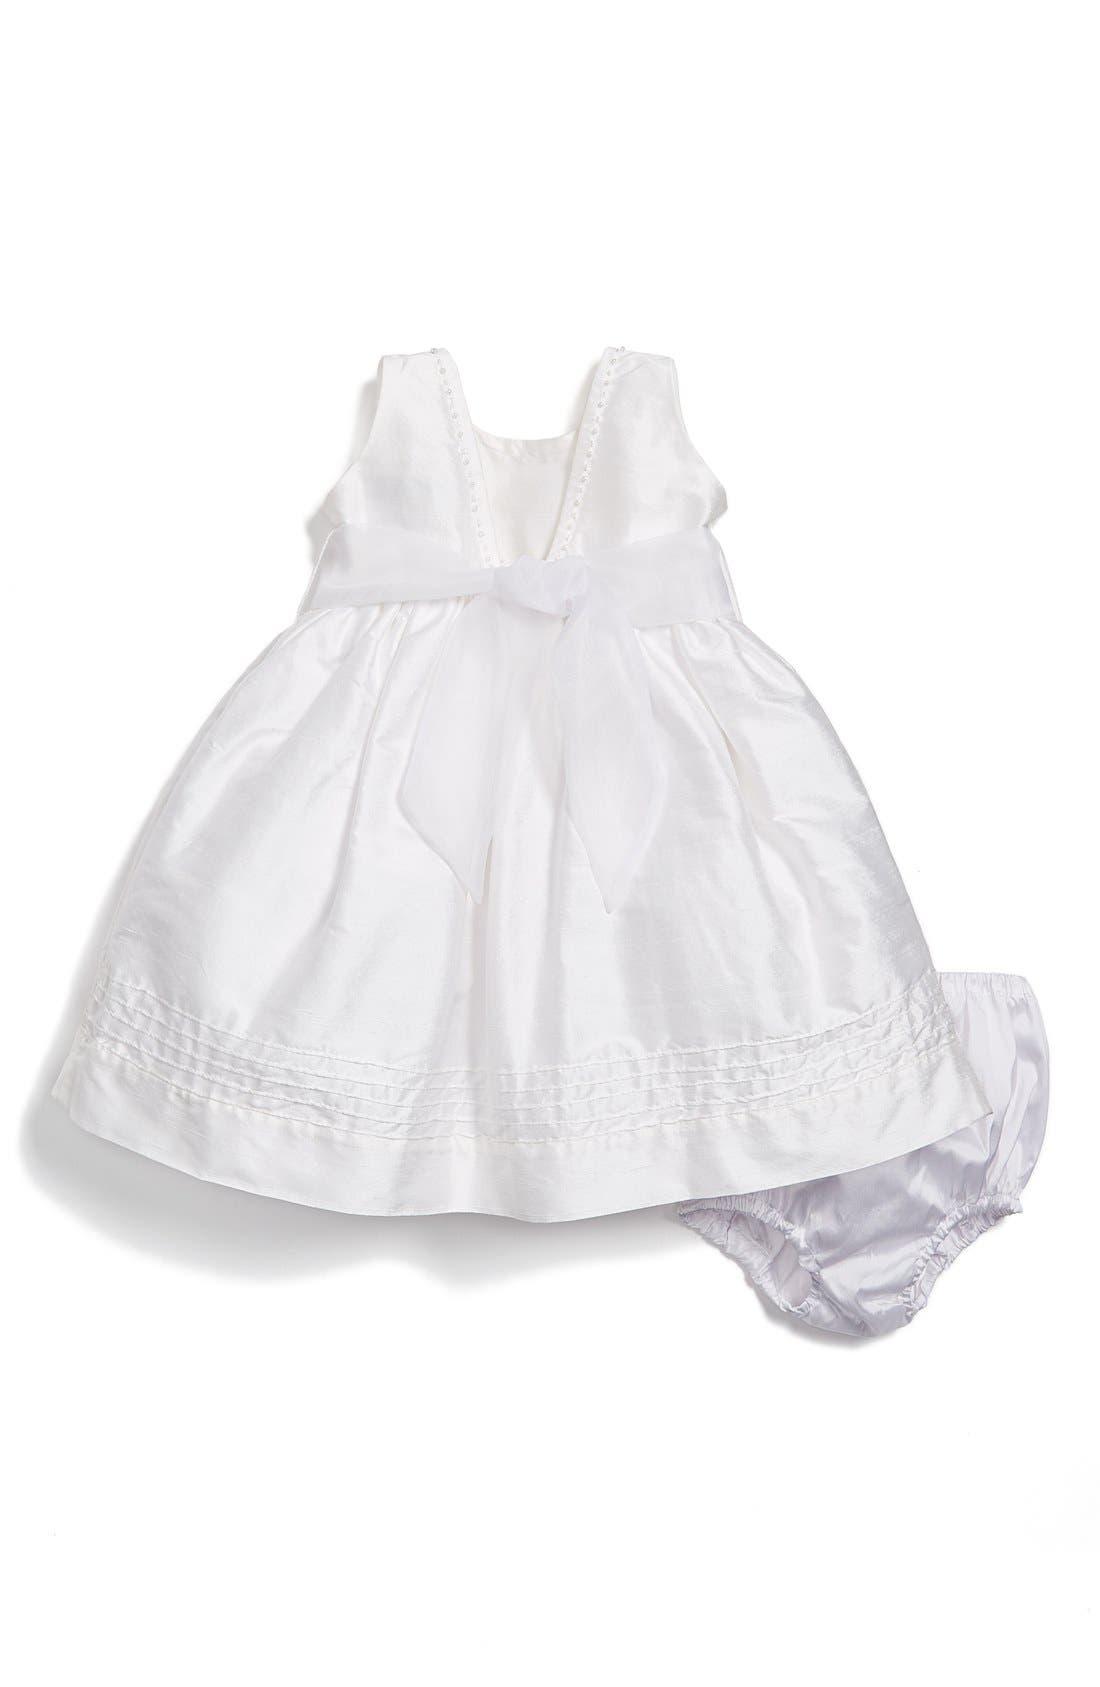 'Melody' Sleeveless Dress,                             Alternate thumbnail 2, color,                             White